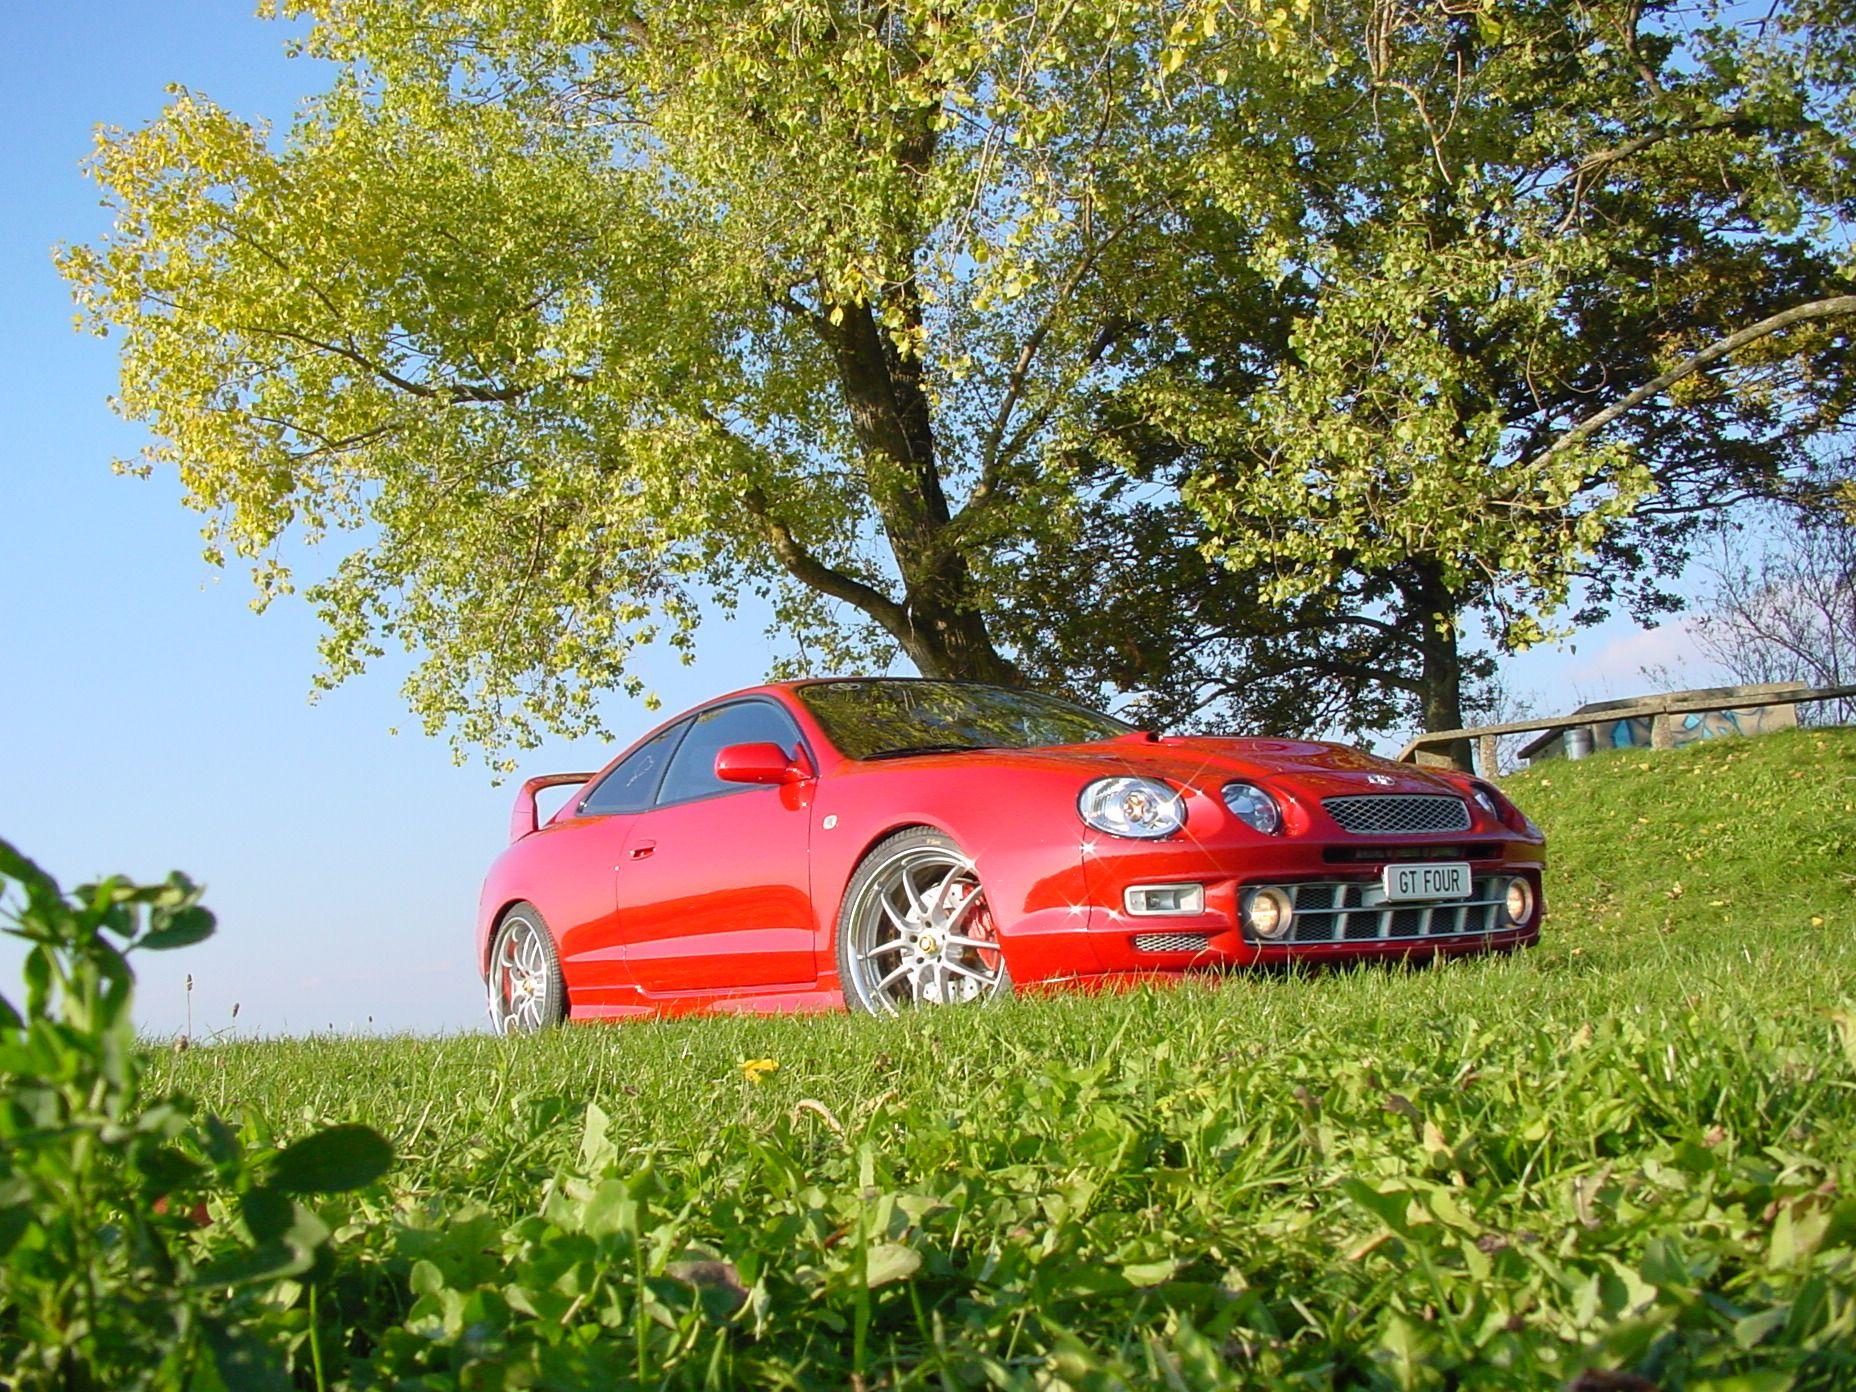 zur Uebersicht - Photo by GT FOUR Drivers Club - Screen Saver